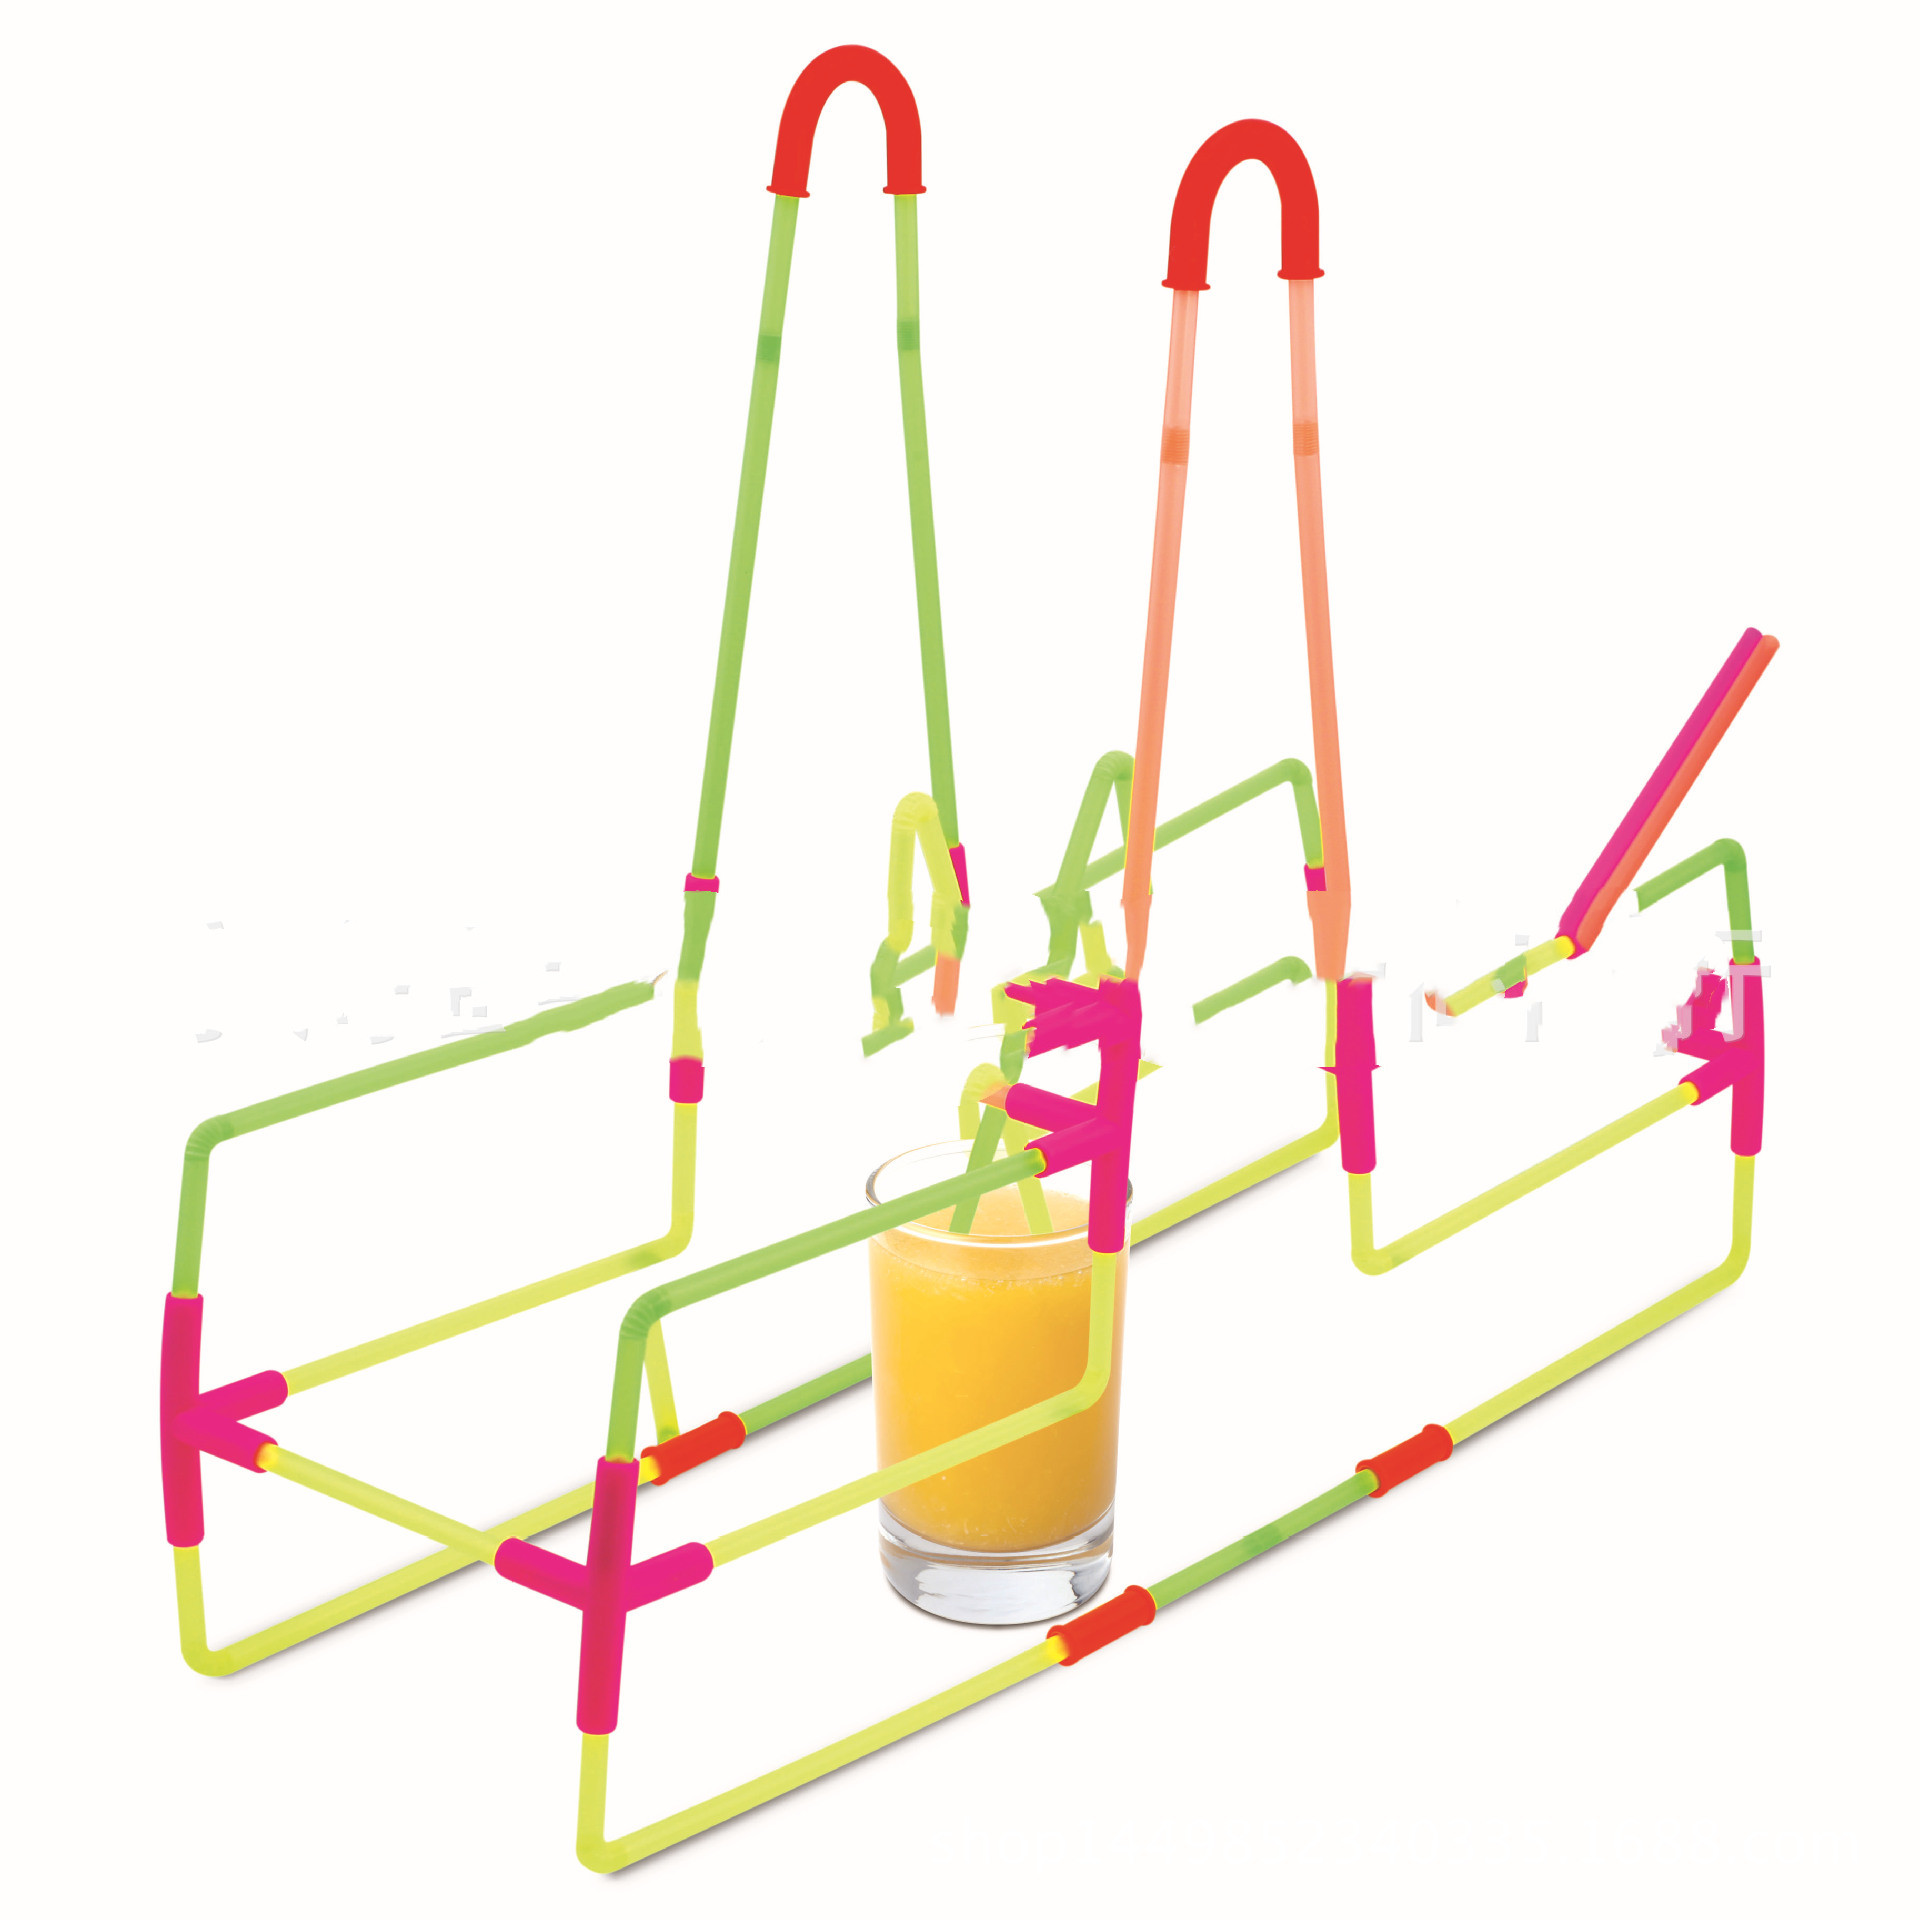 DIY Fun Drinking Straw Connector Kit 4